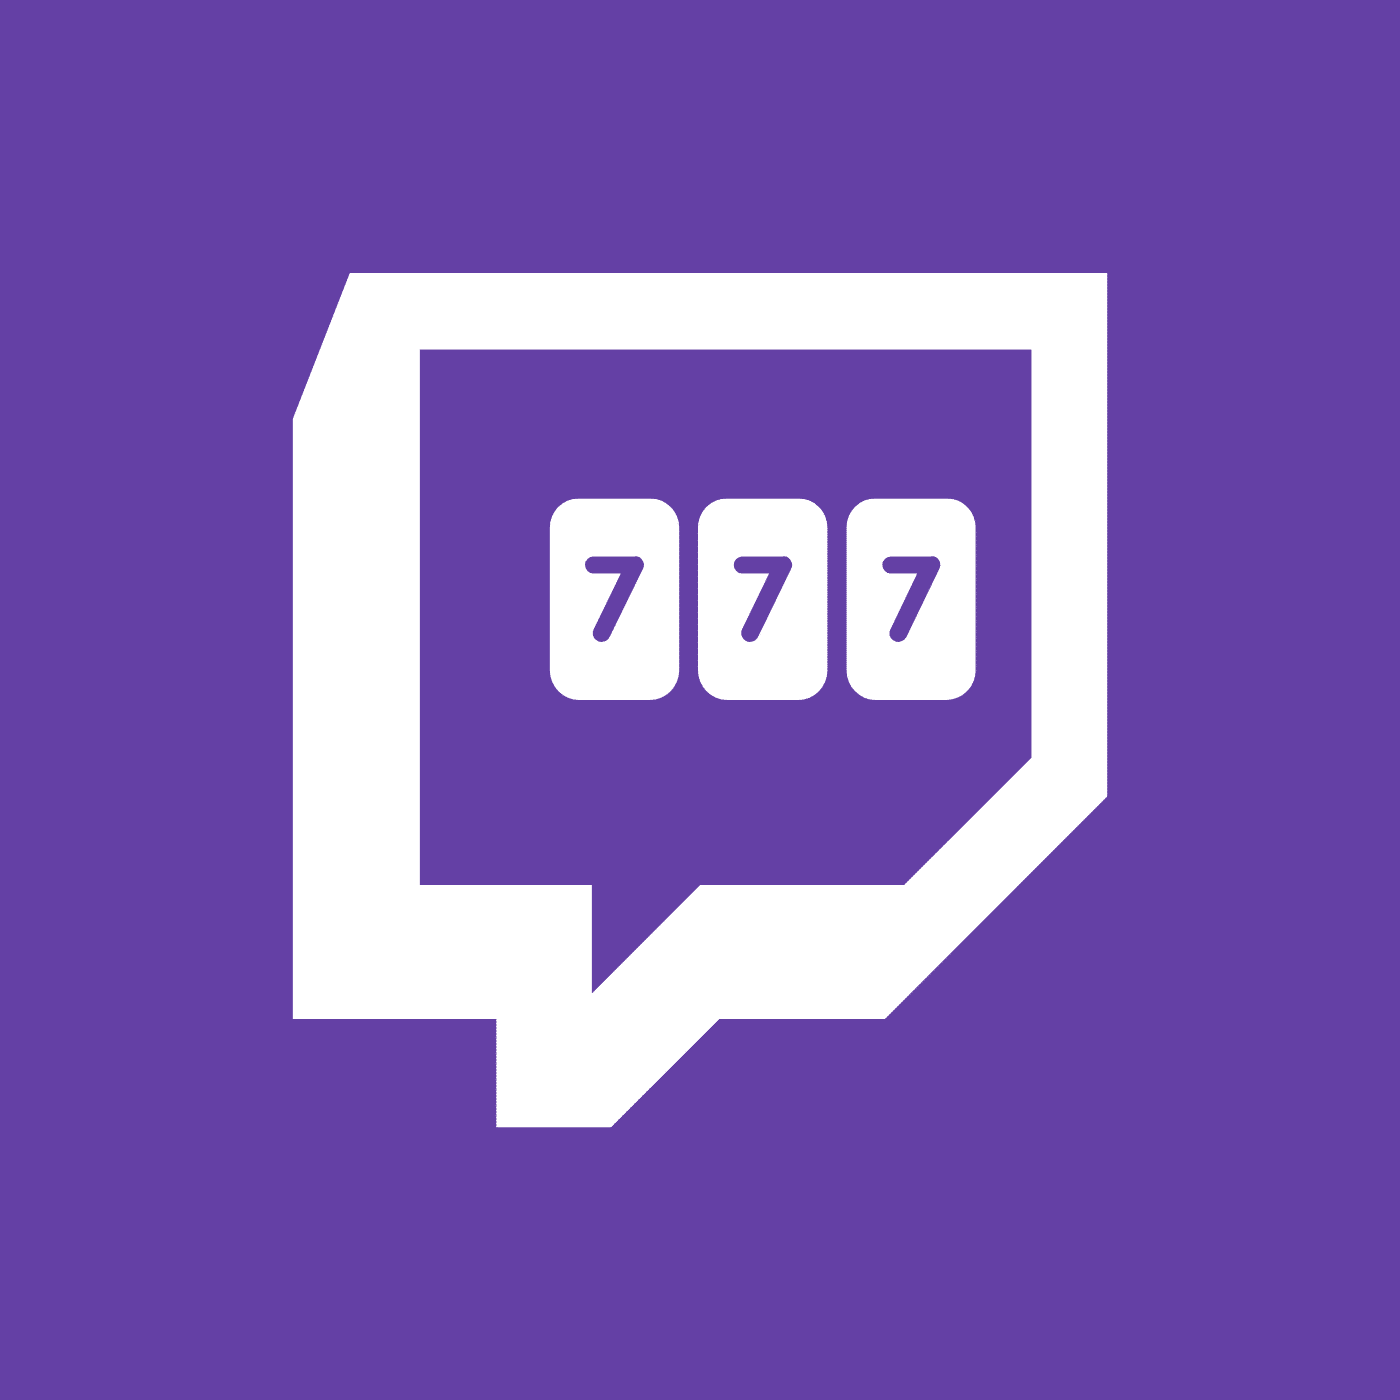 Twitch & Τζόγος: Ένας προβληματισμός για το φαινόμενο